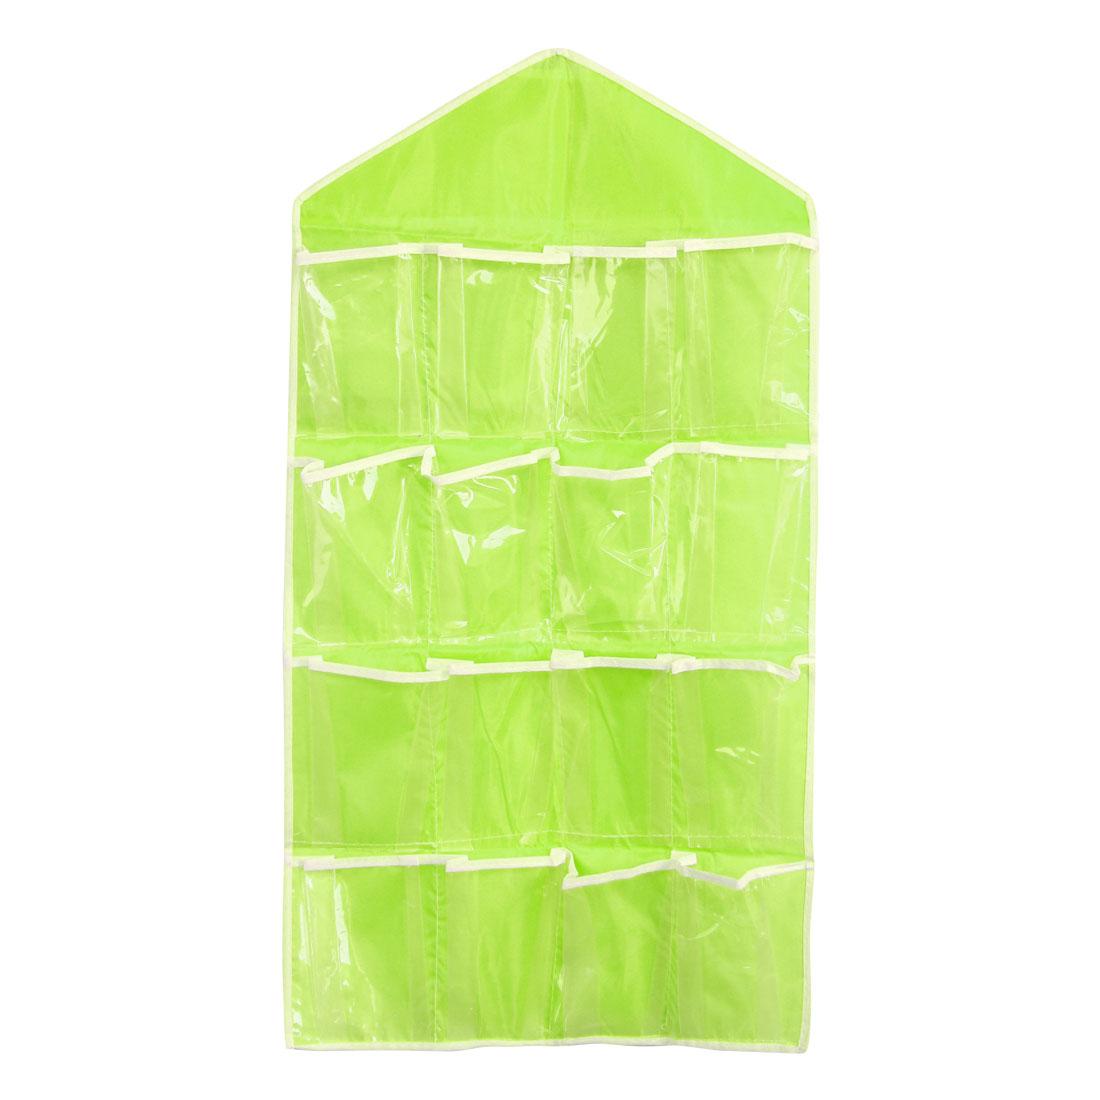 Wall Door Closet Multilayer Hanging Storage Bag Case Organizer Pouch Green